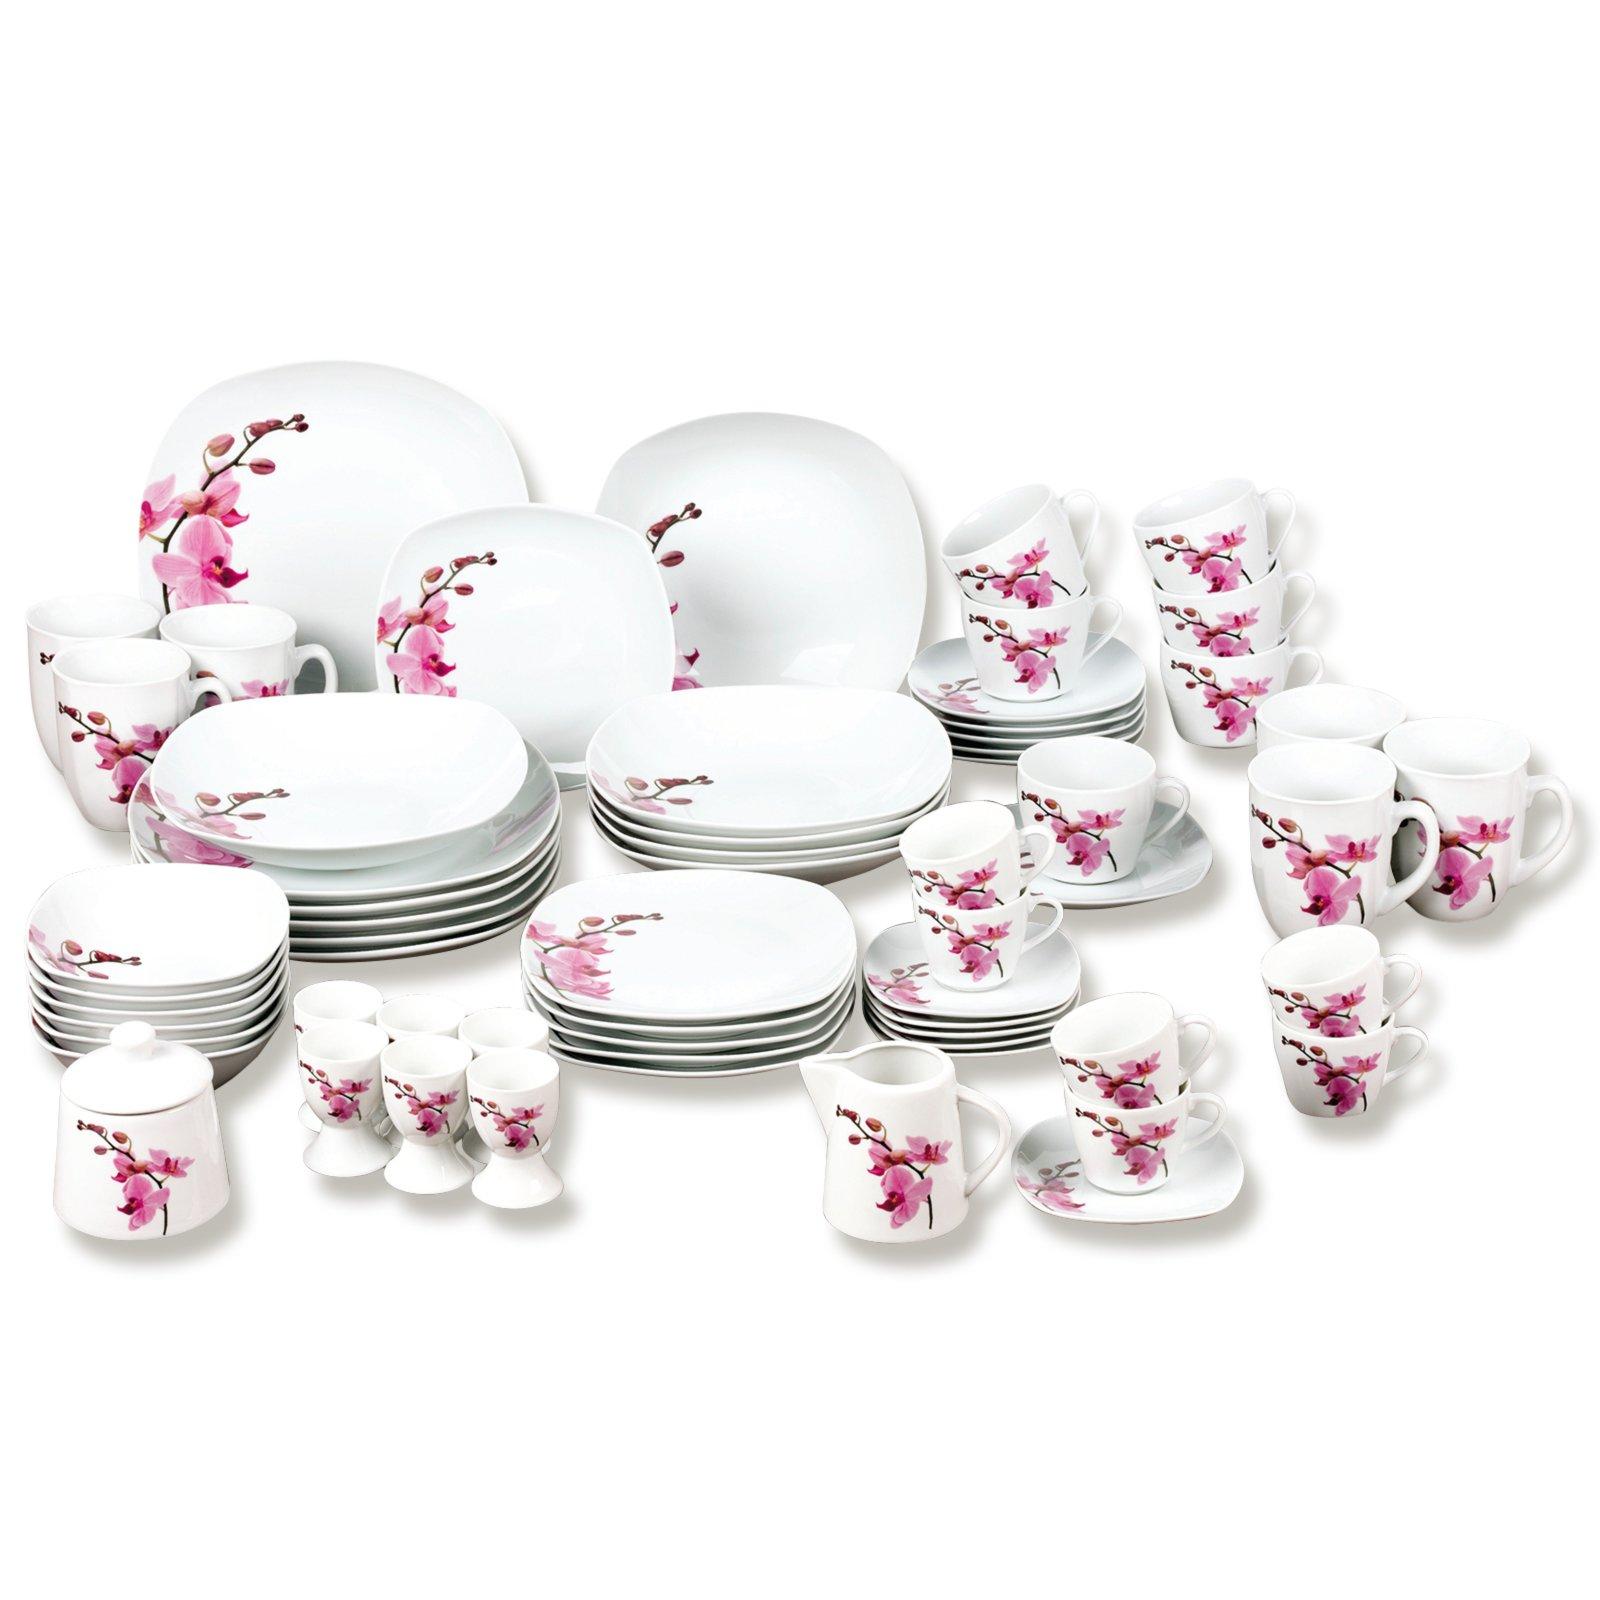 62 teiliges kombiservice kyoto wei rosa eckig geschirr haushalts k chenzubeh r. Black Bedroom Furniture Sets. Home Design Ideas